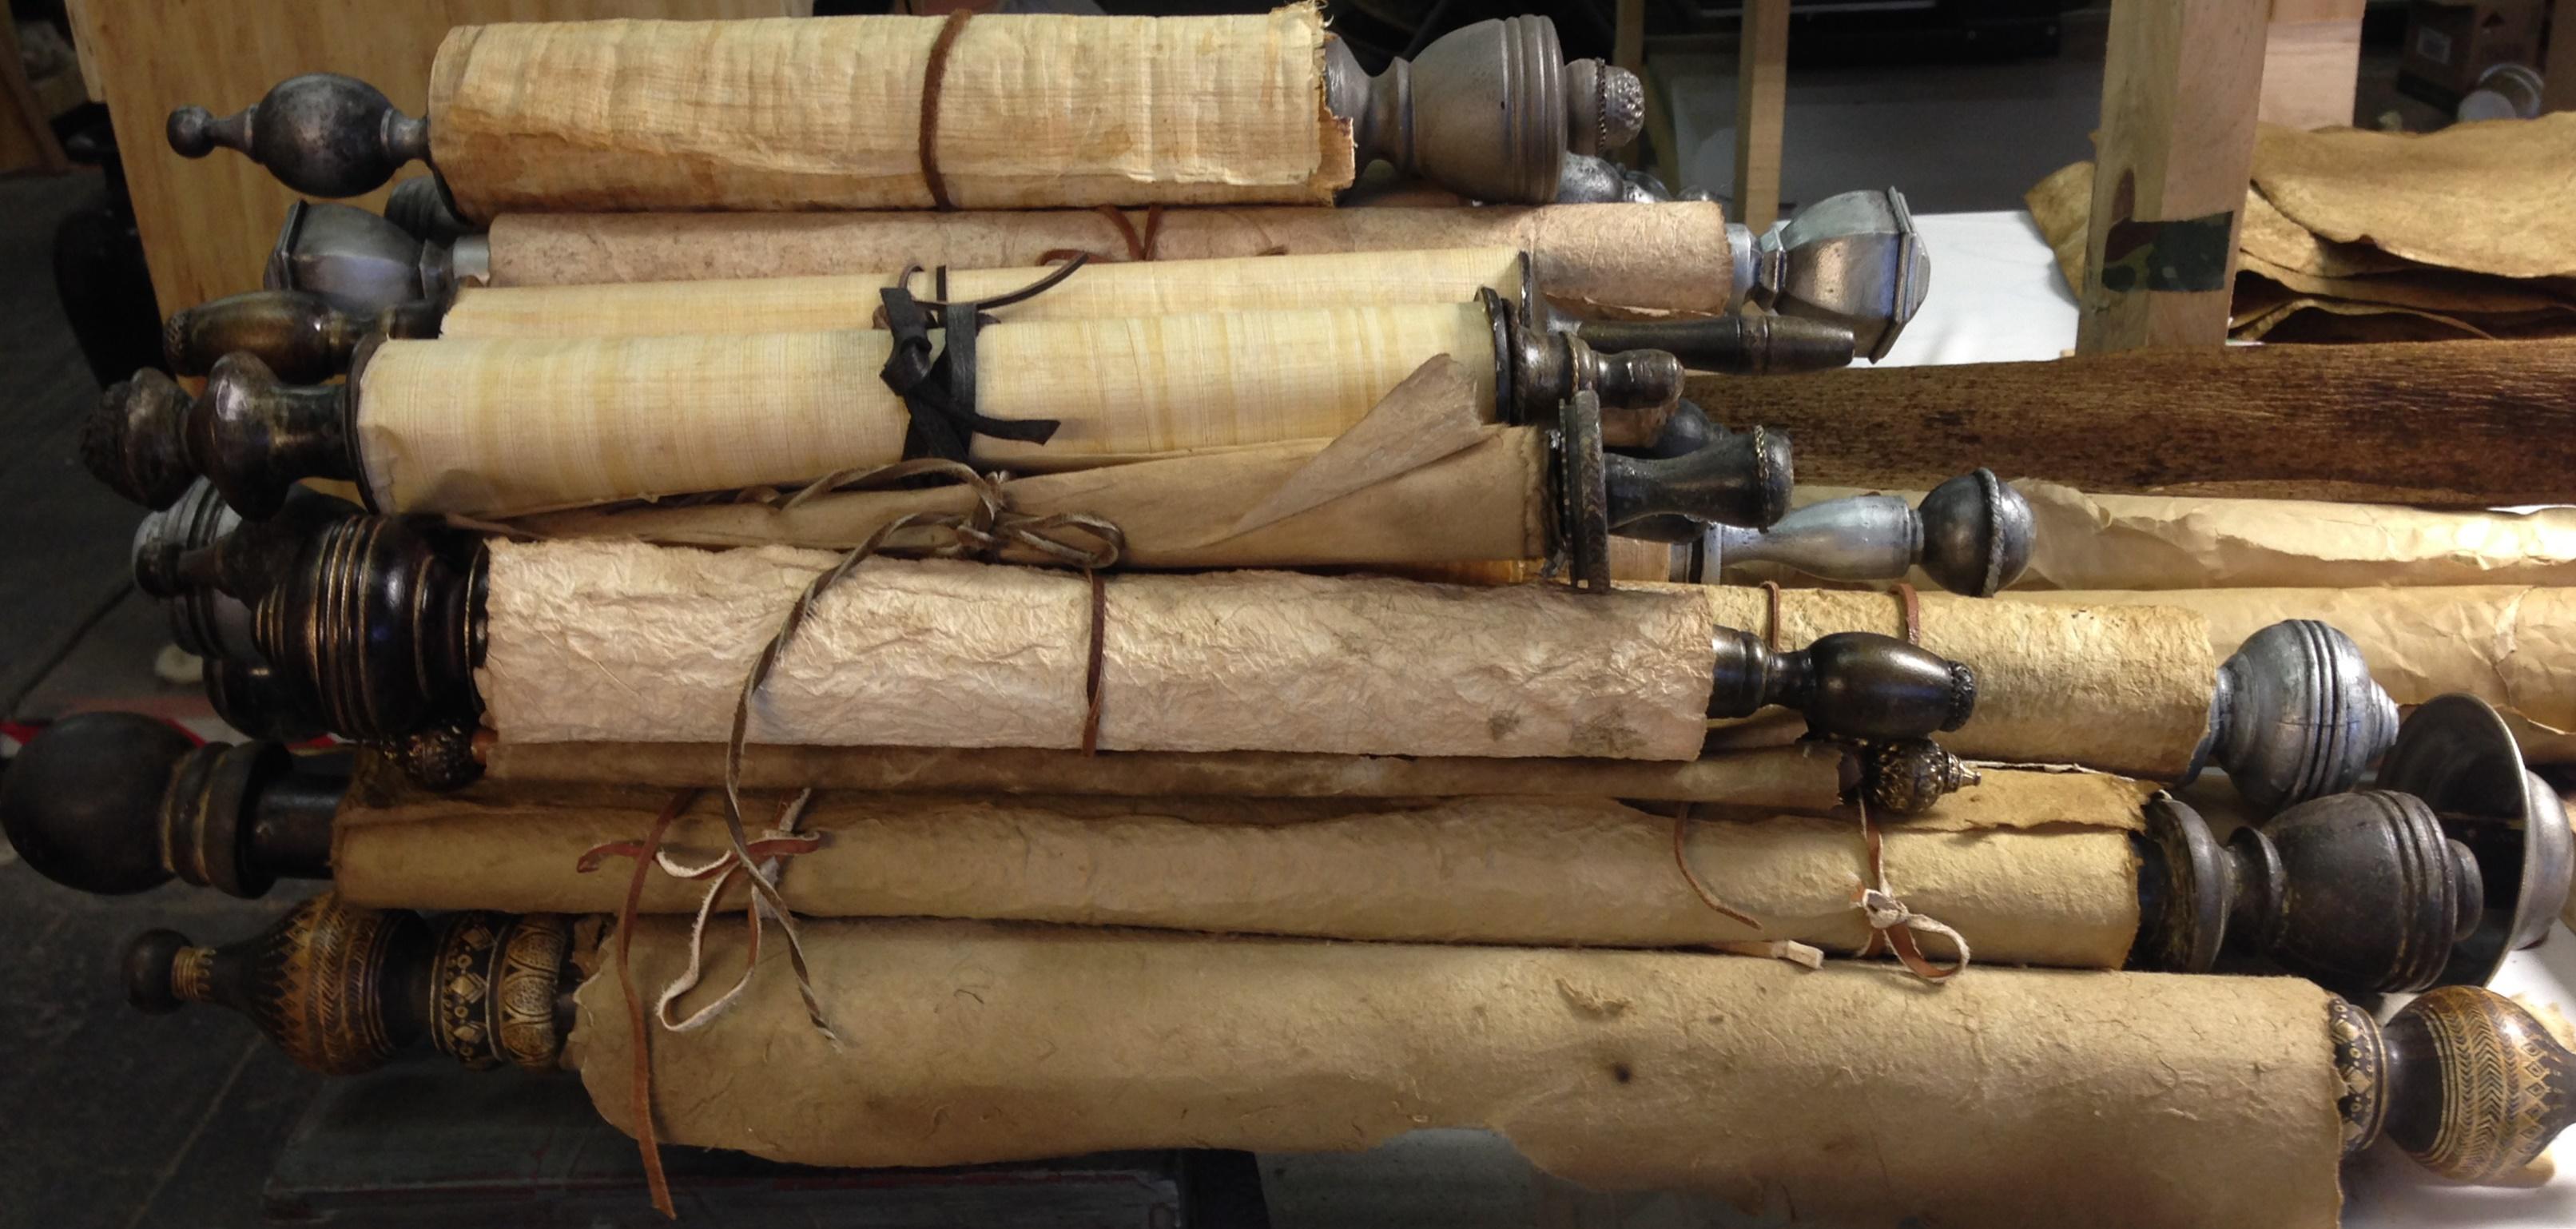 Fabricated scrolls